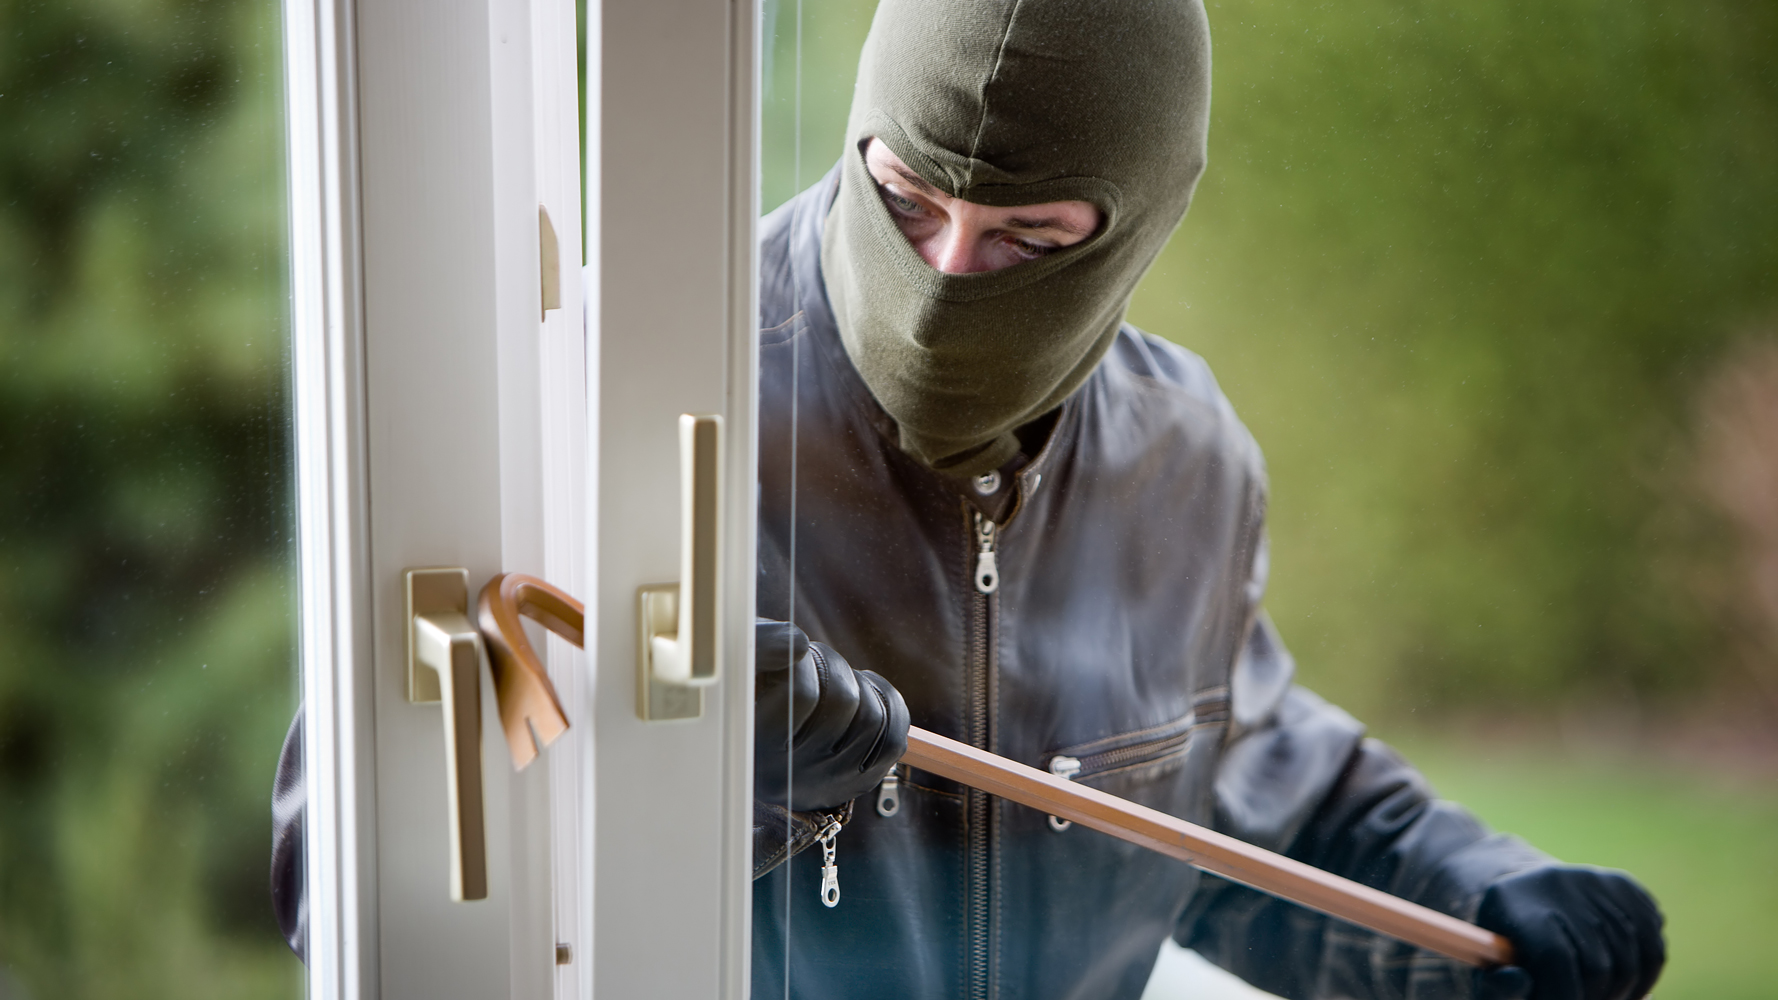 Wird Hausrats-Versicherung je nach Gefahr am Ort teurer?